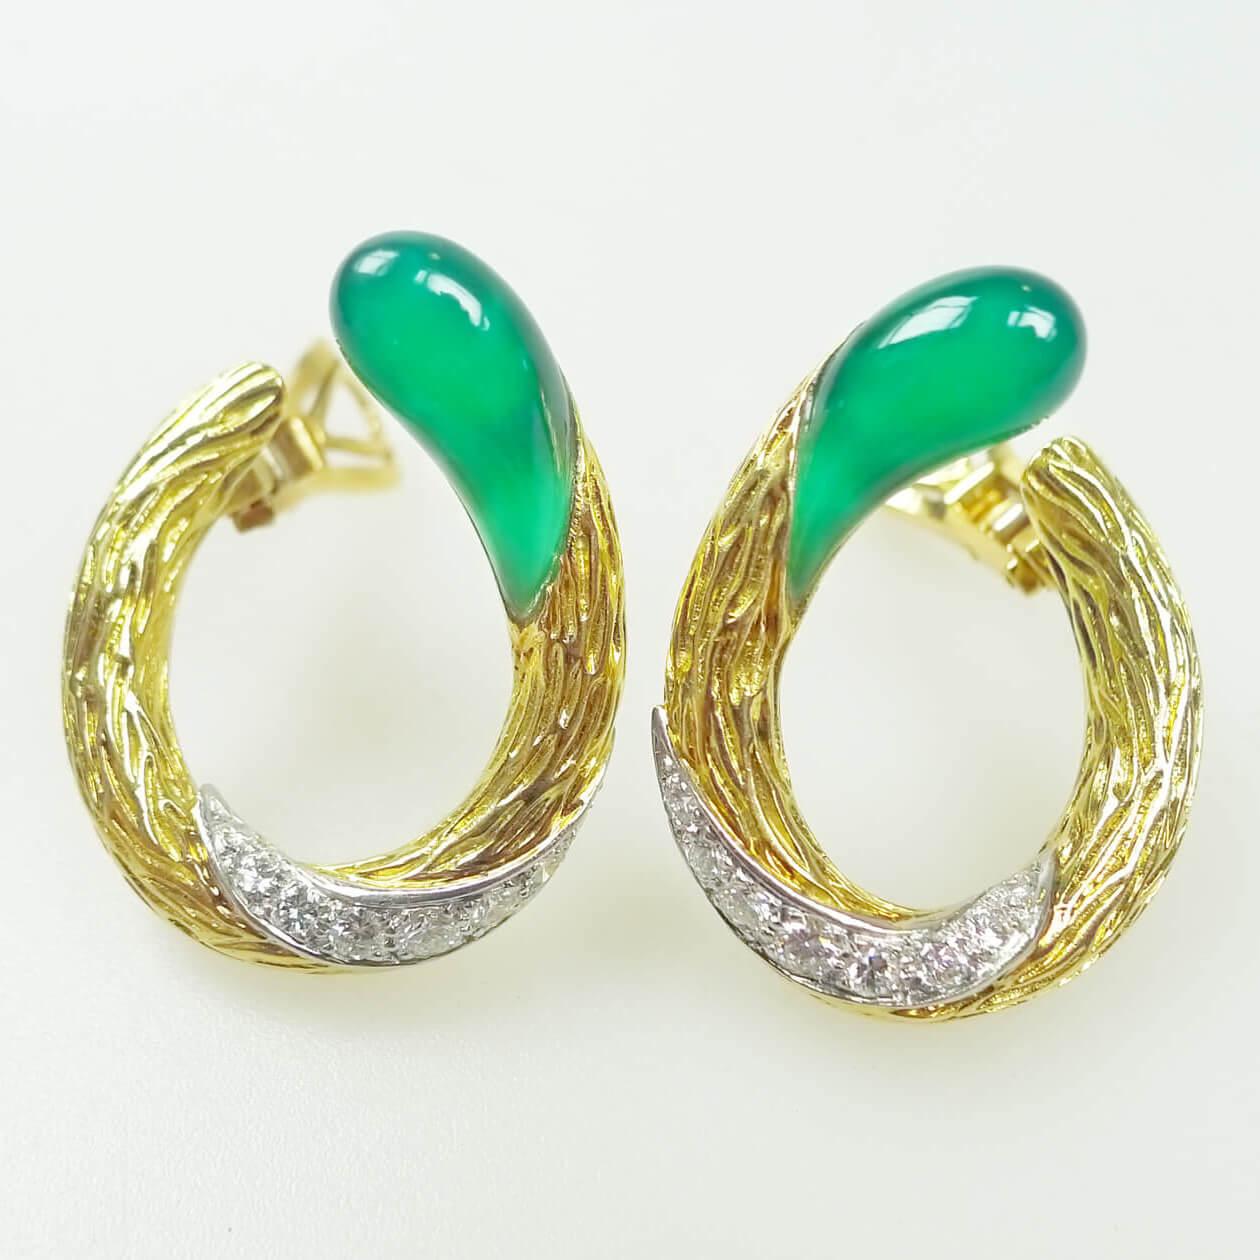 Green Onyx & Diamond Earrings By Mauboussin Paris